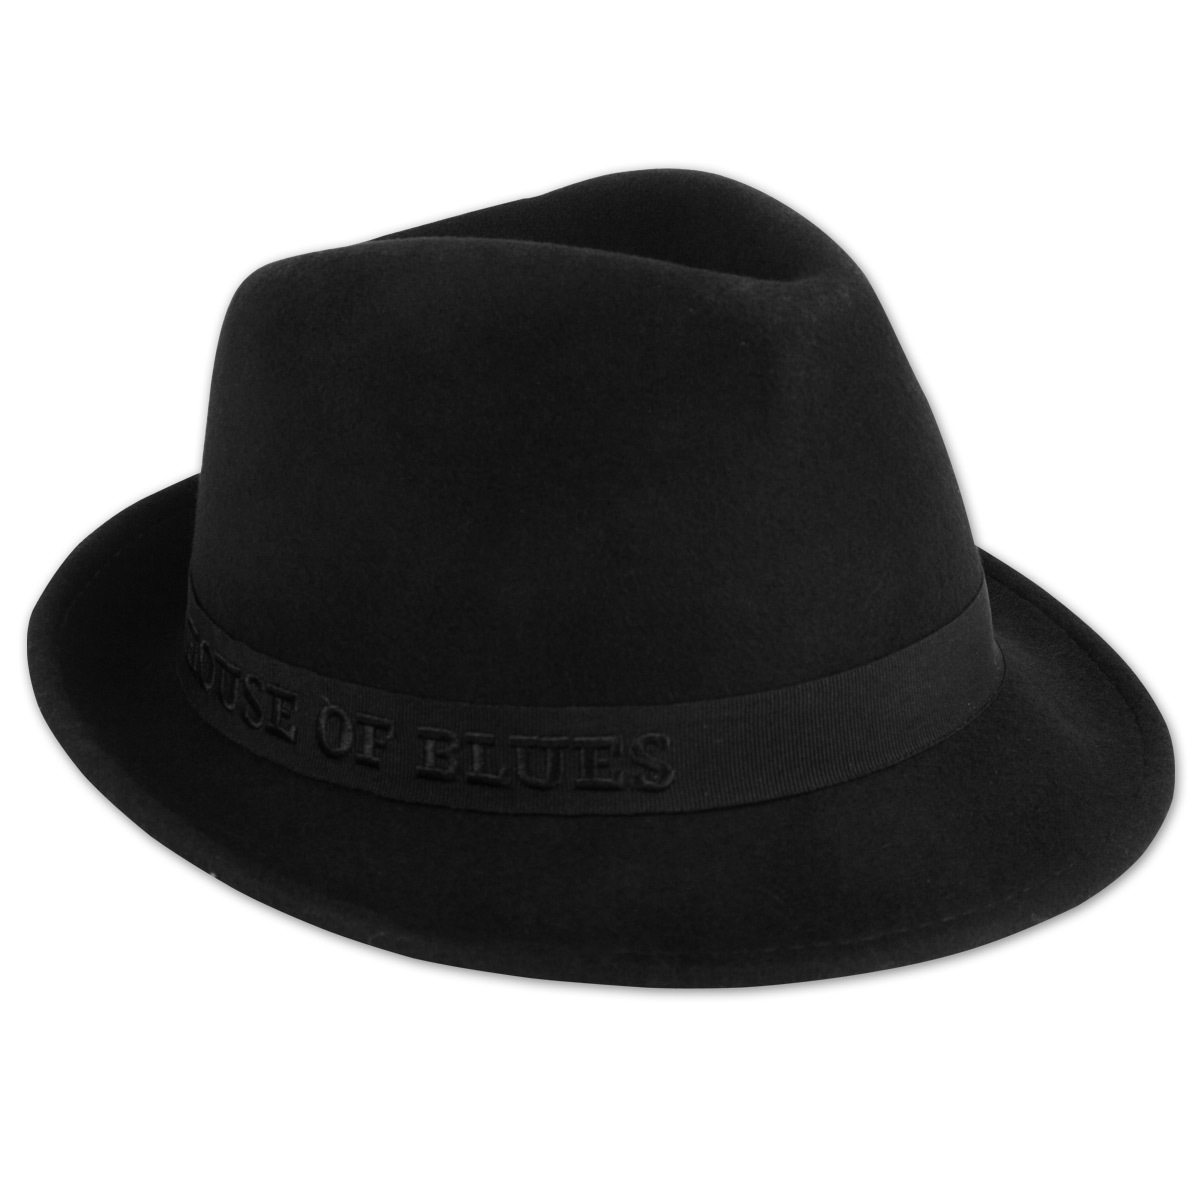 House of Blues Black Fedora Hat